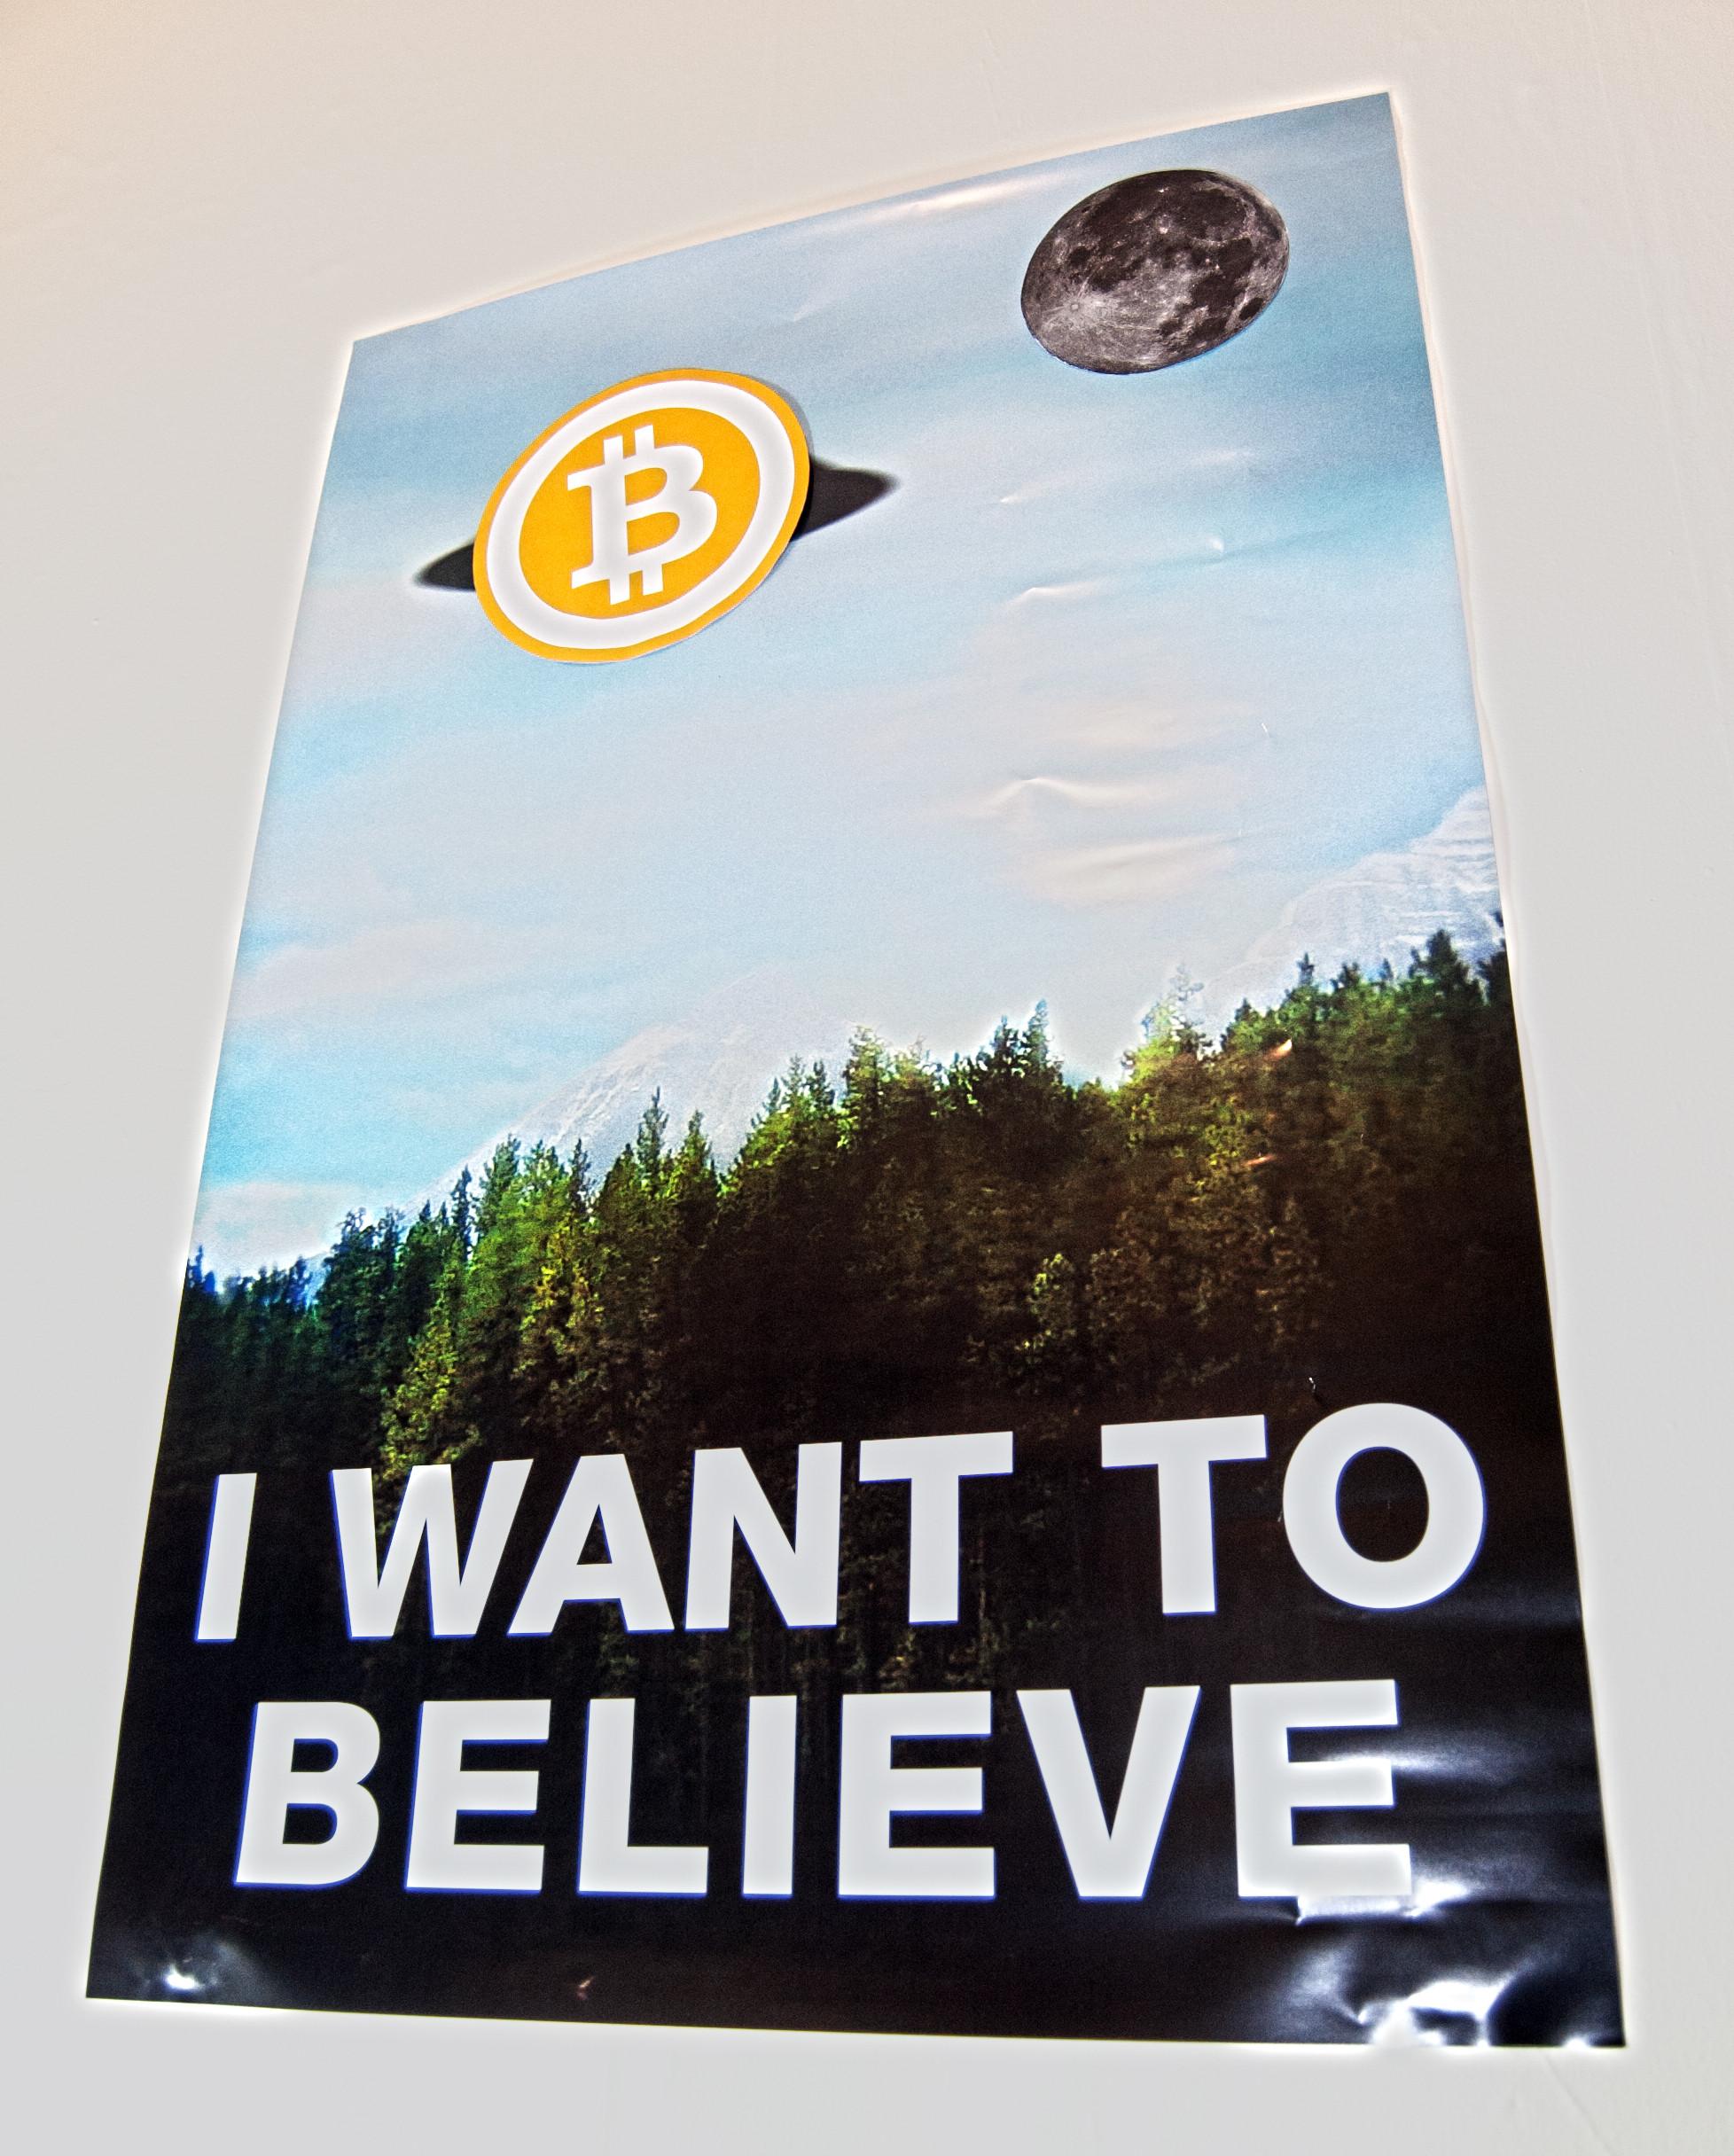 Believe in Bitcoin mod